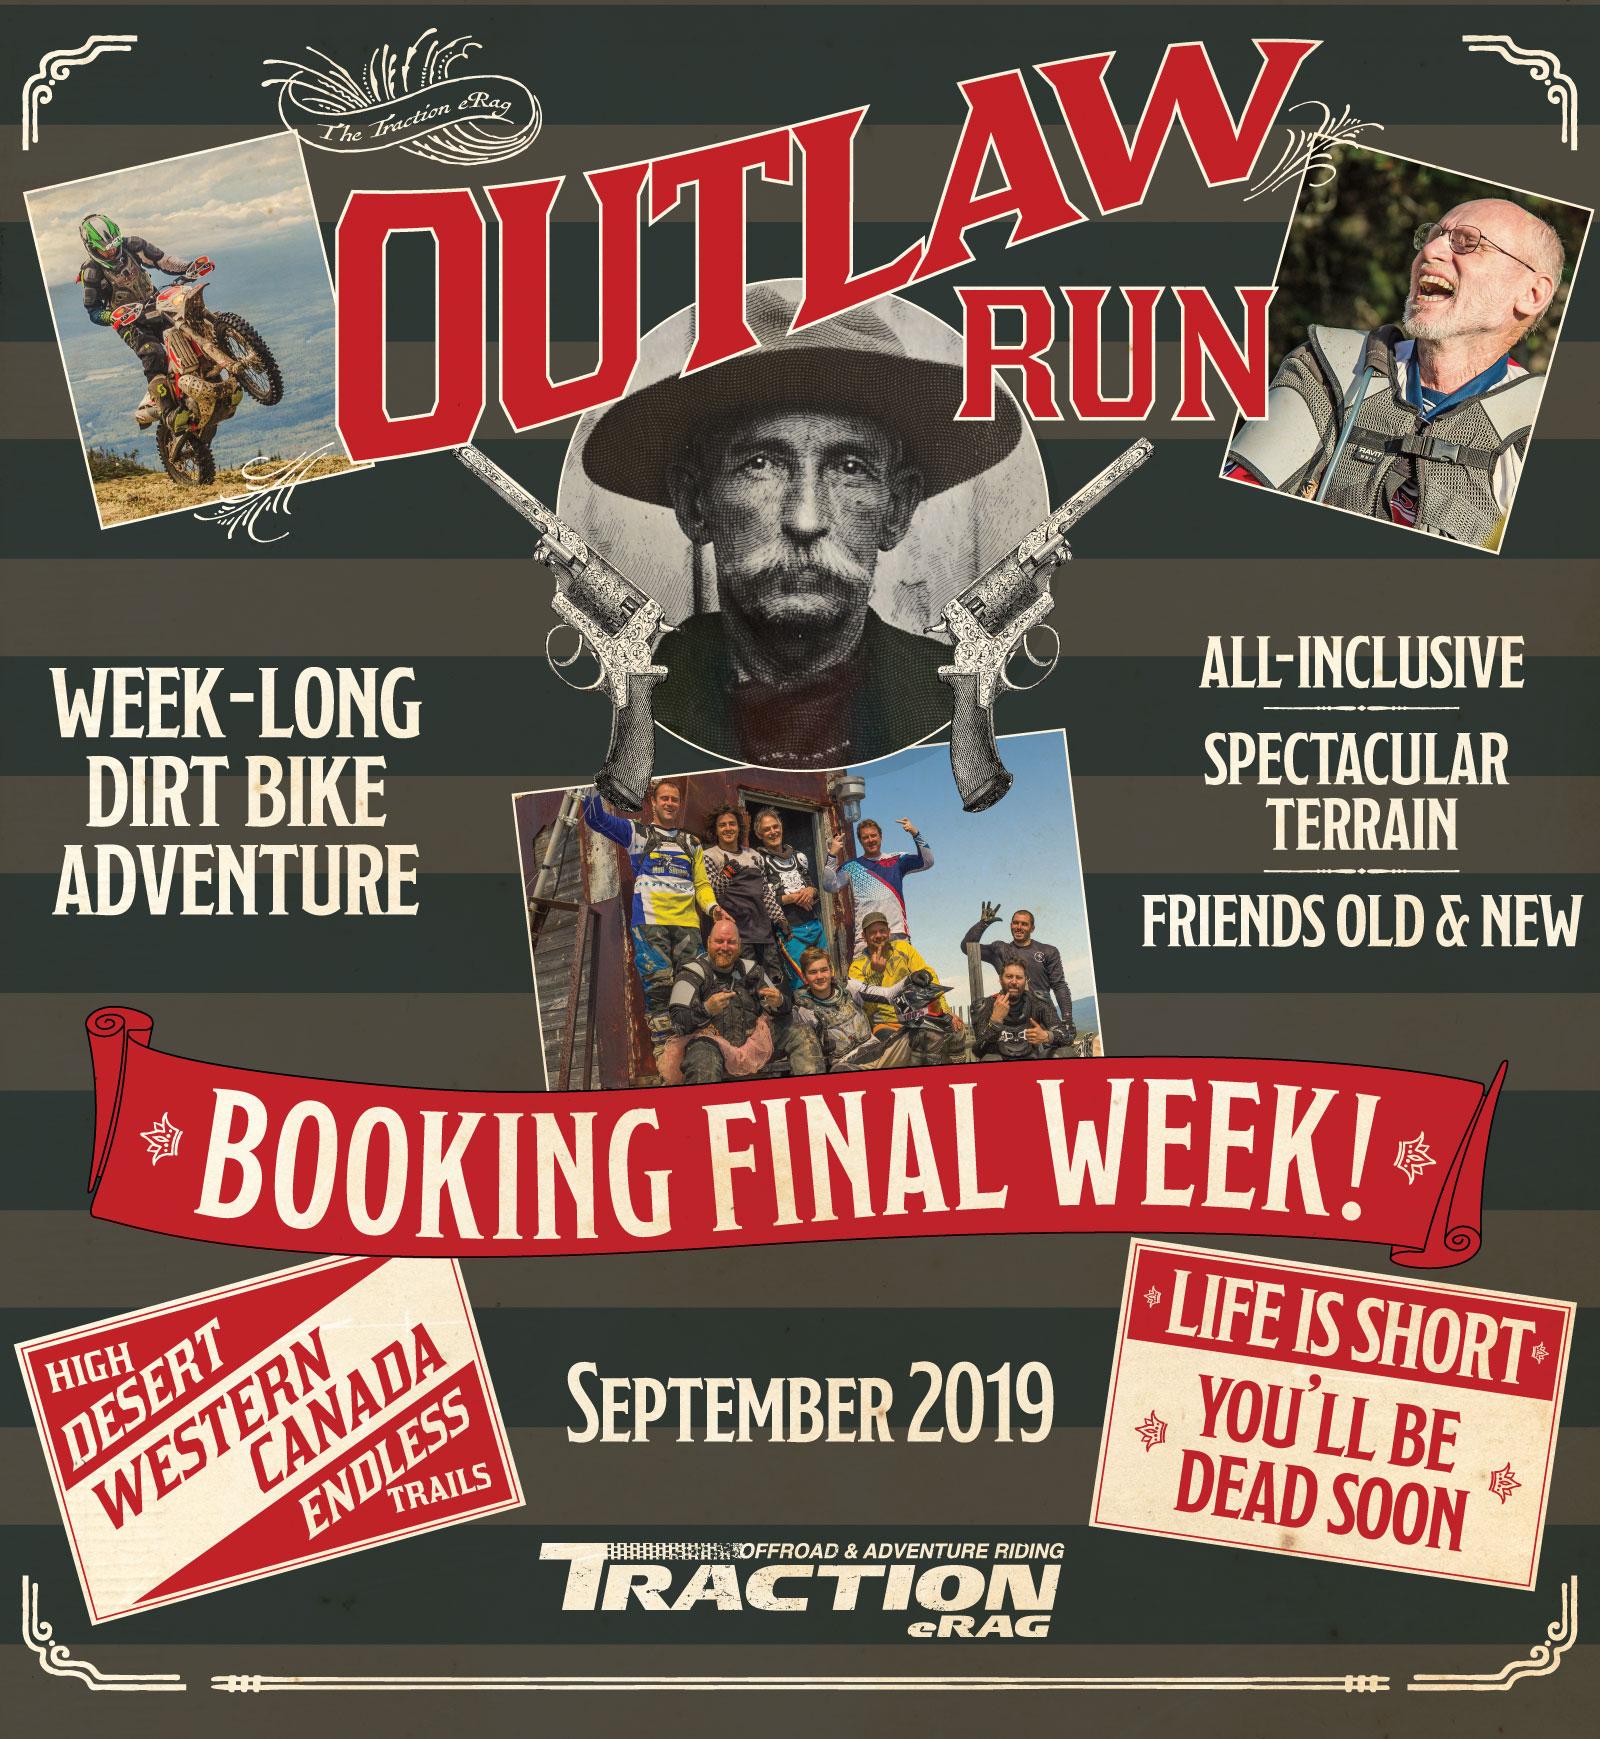 Outlaw-Run-Promo-Last-week-1600px.jpg